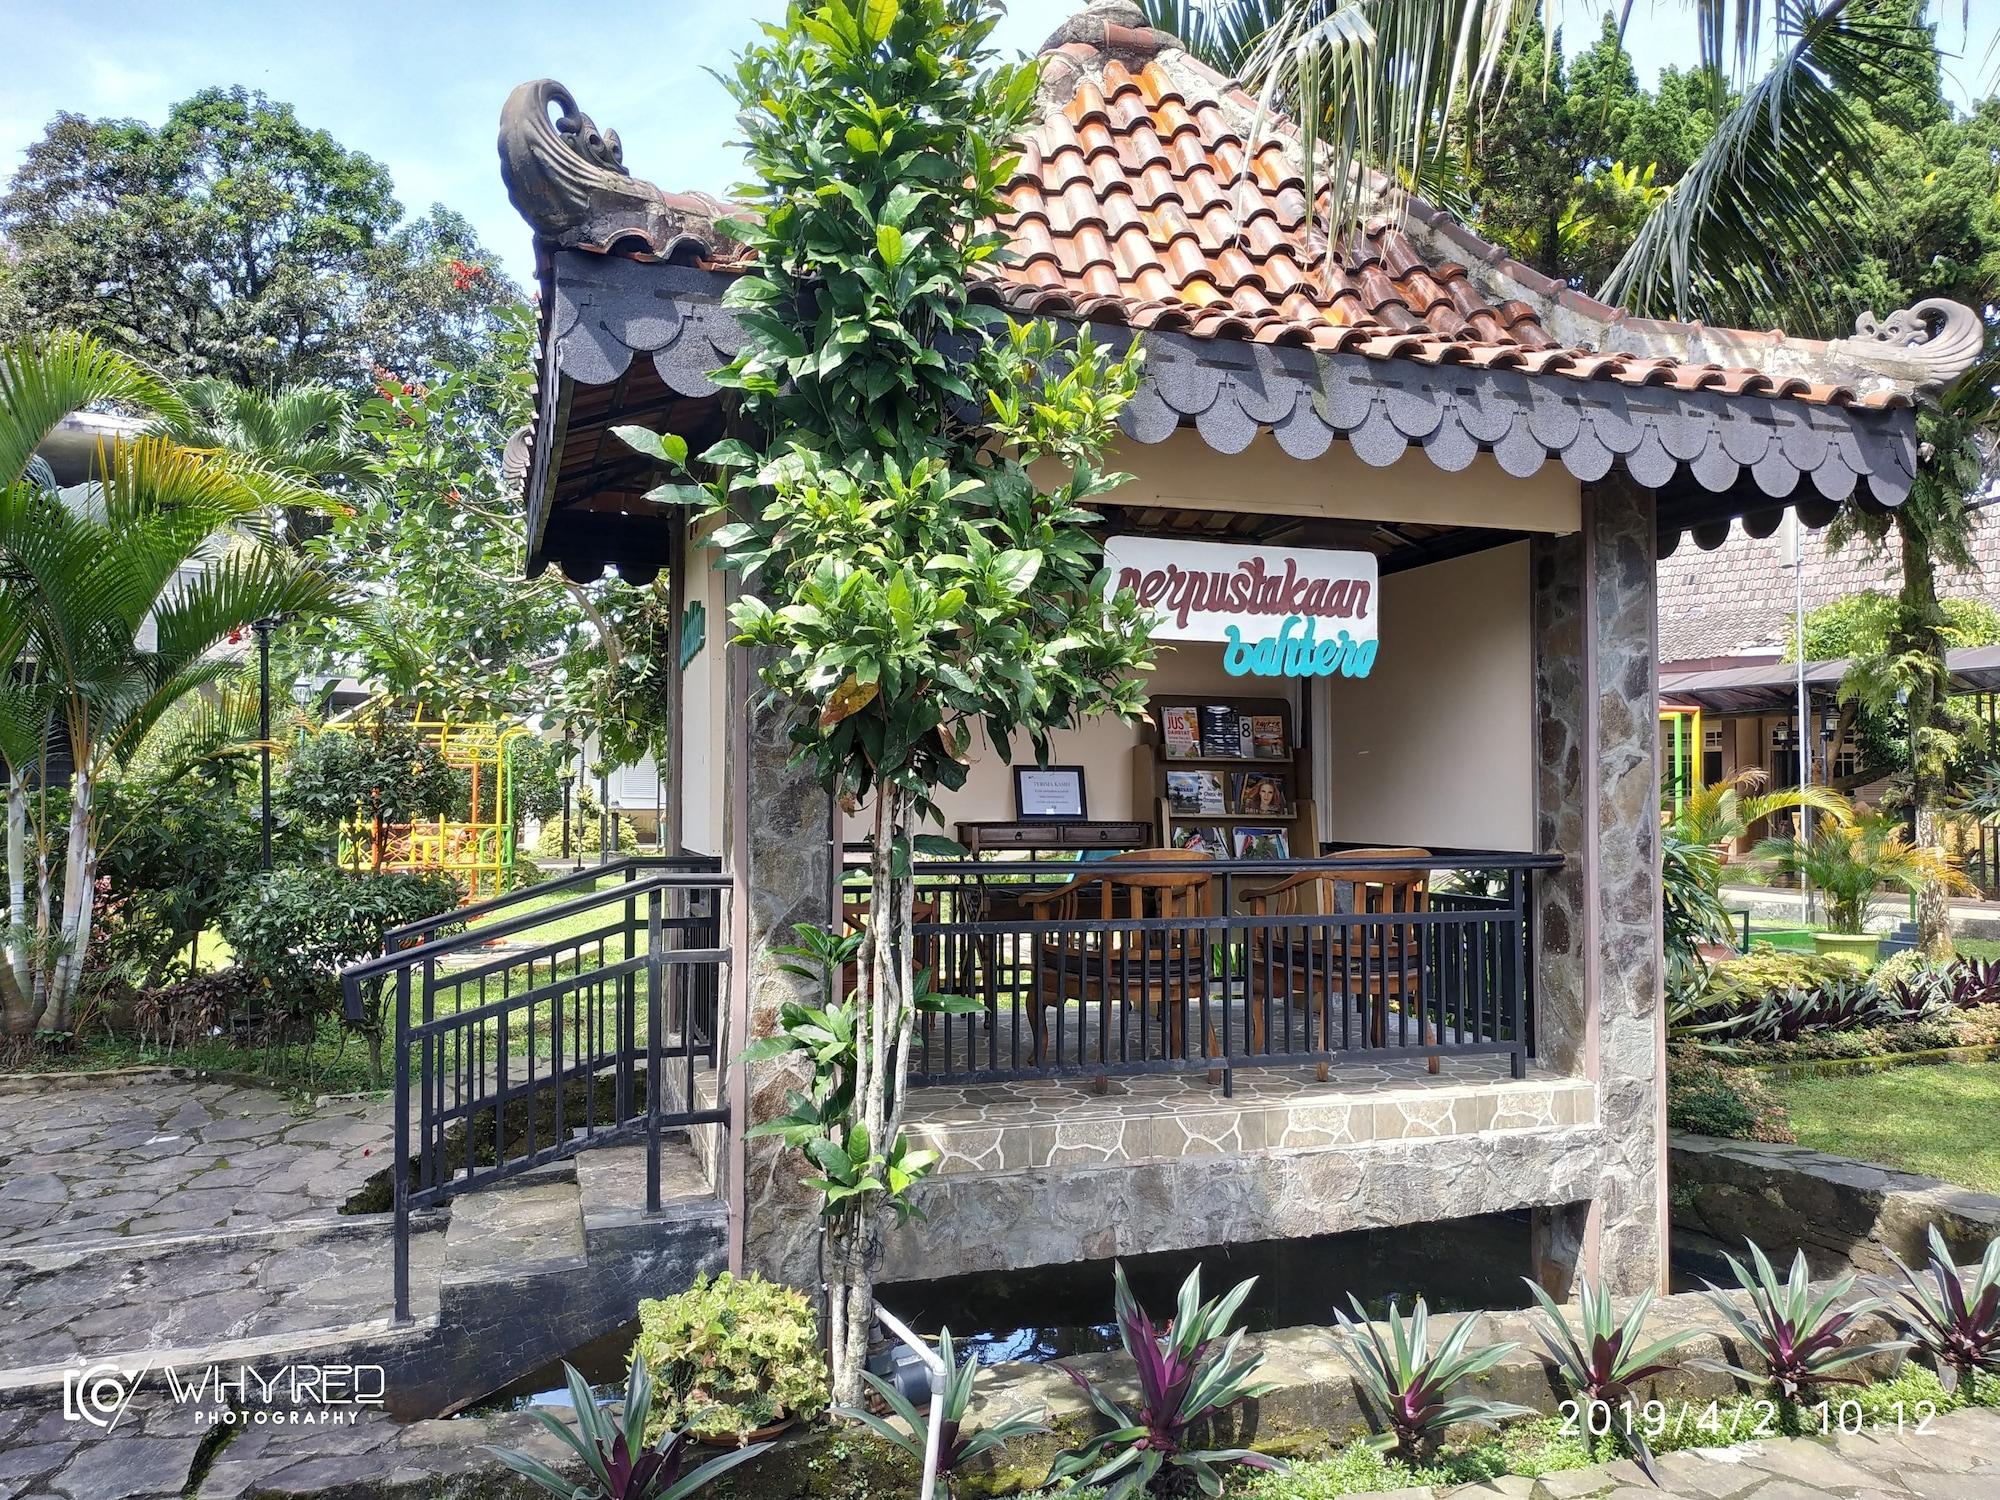 Hotel Bahtera PT.Pelni, Bogor